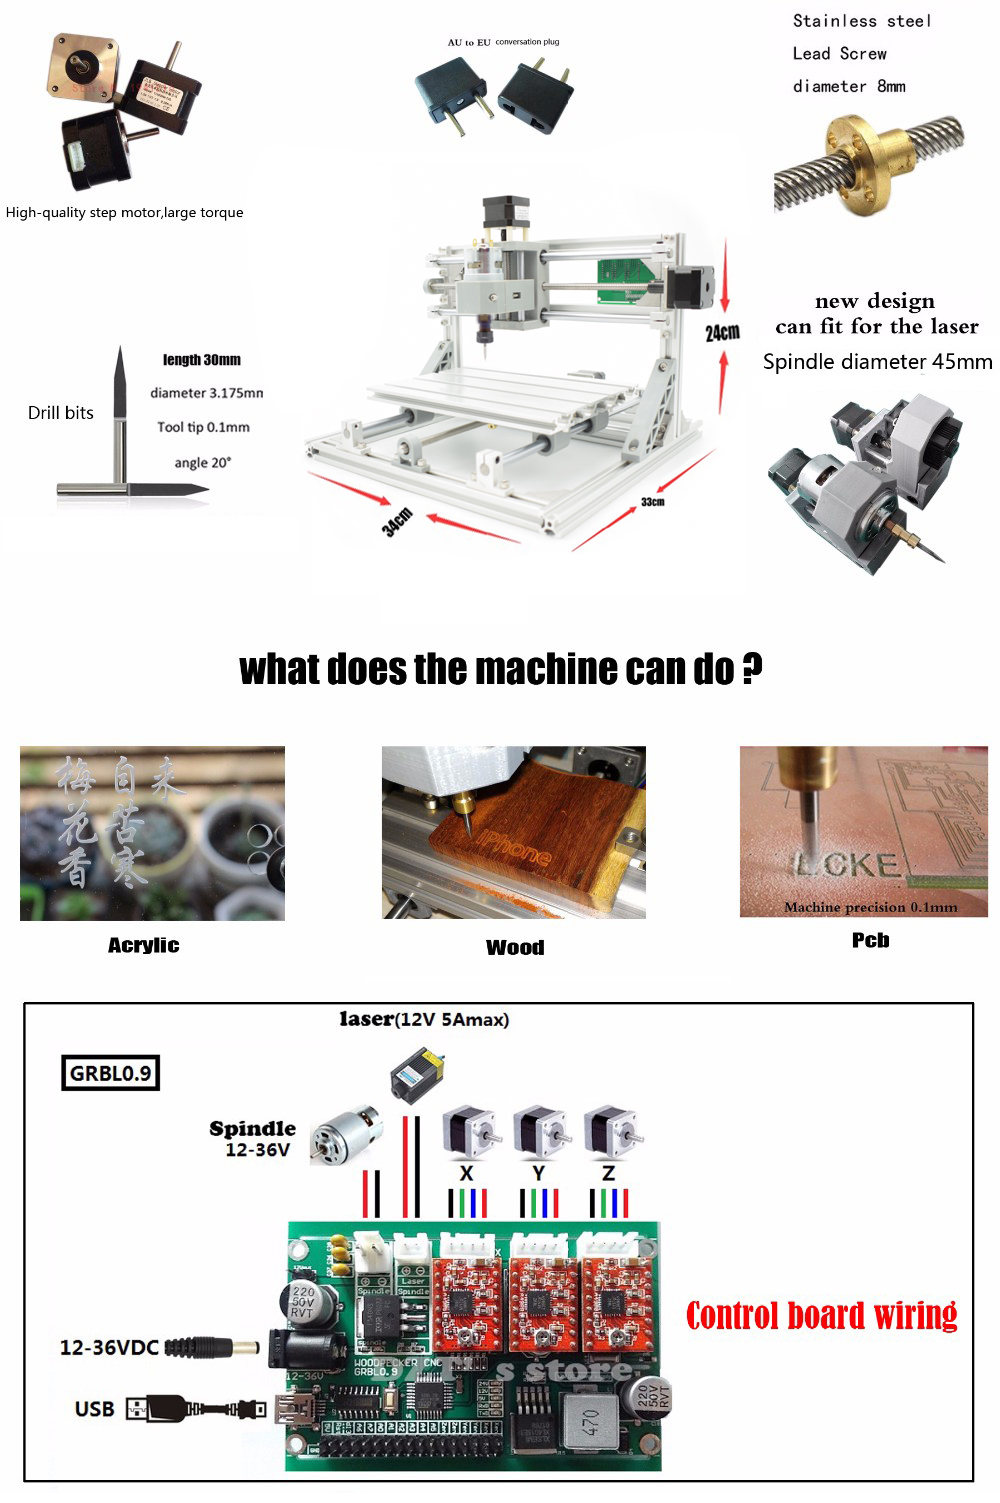 Cnc 2418 Er11 Spindle ᗑ Grbl Grbl Diy Cnc Laser Machine